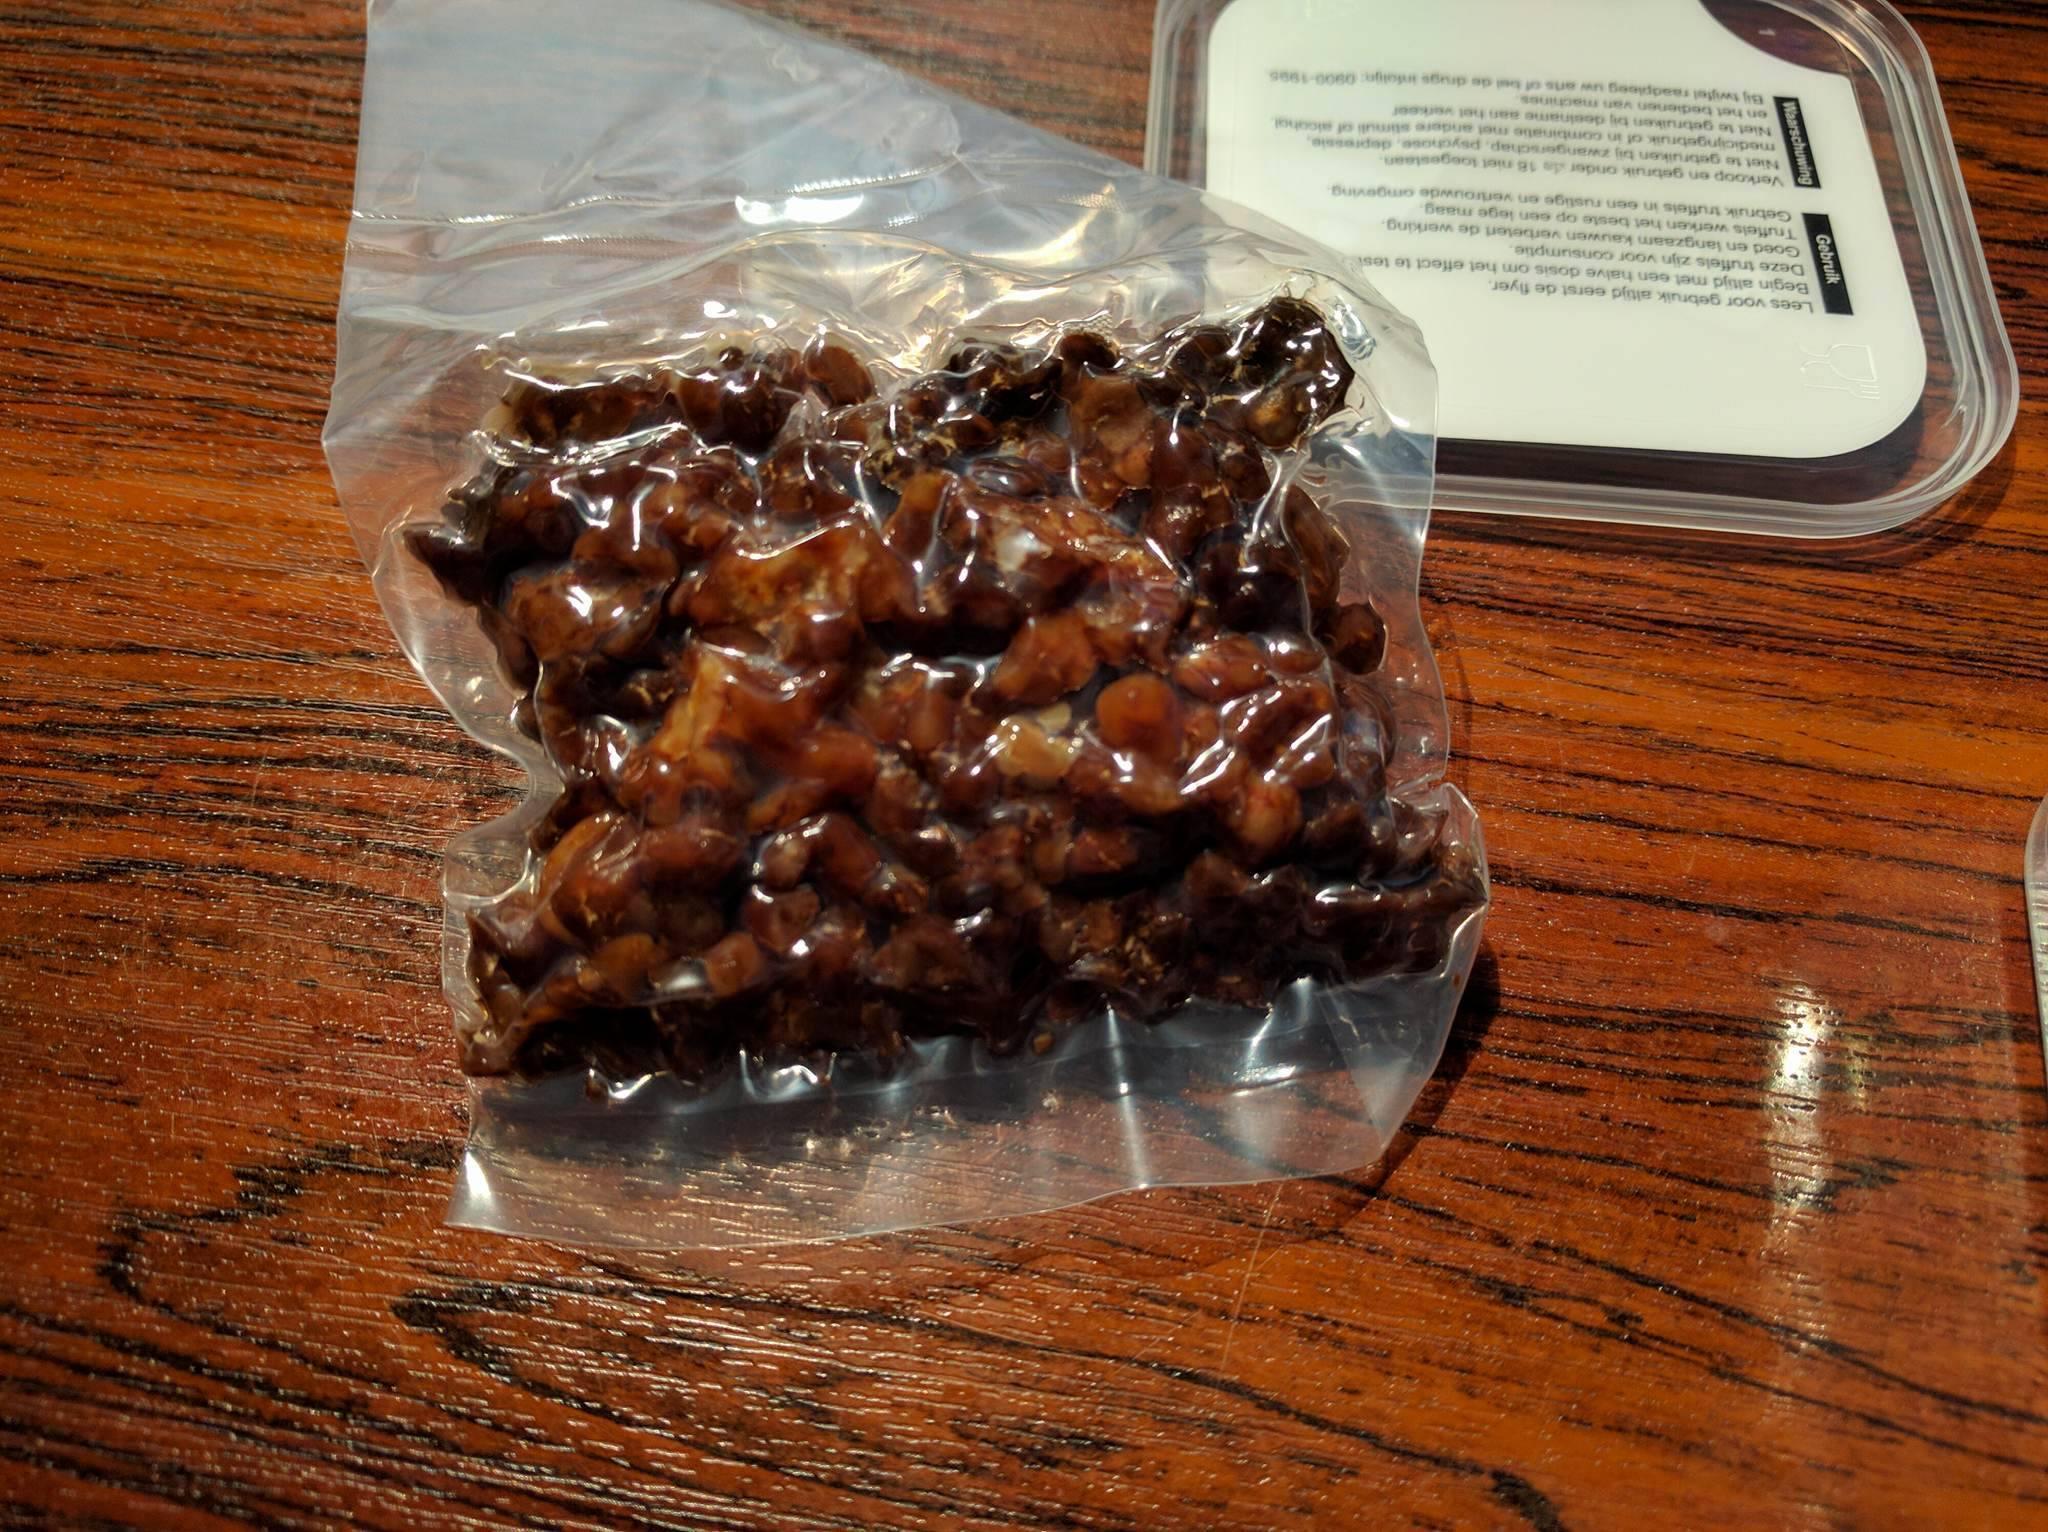 White stuff on magic truffles  - Mushroom Hunting and Identification